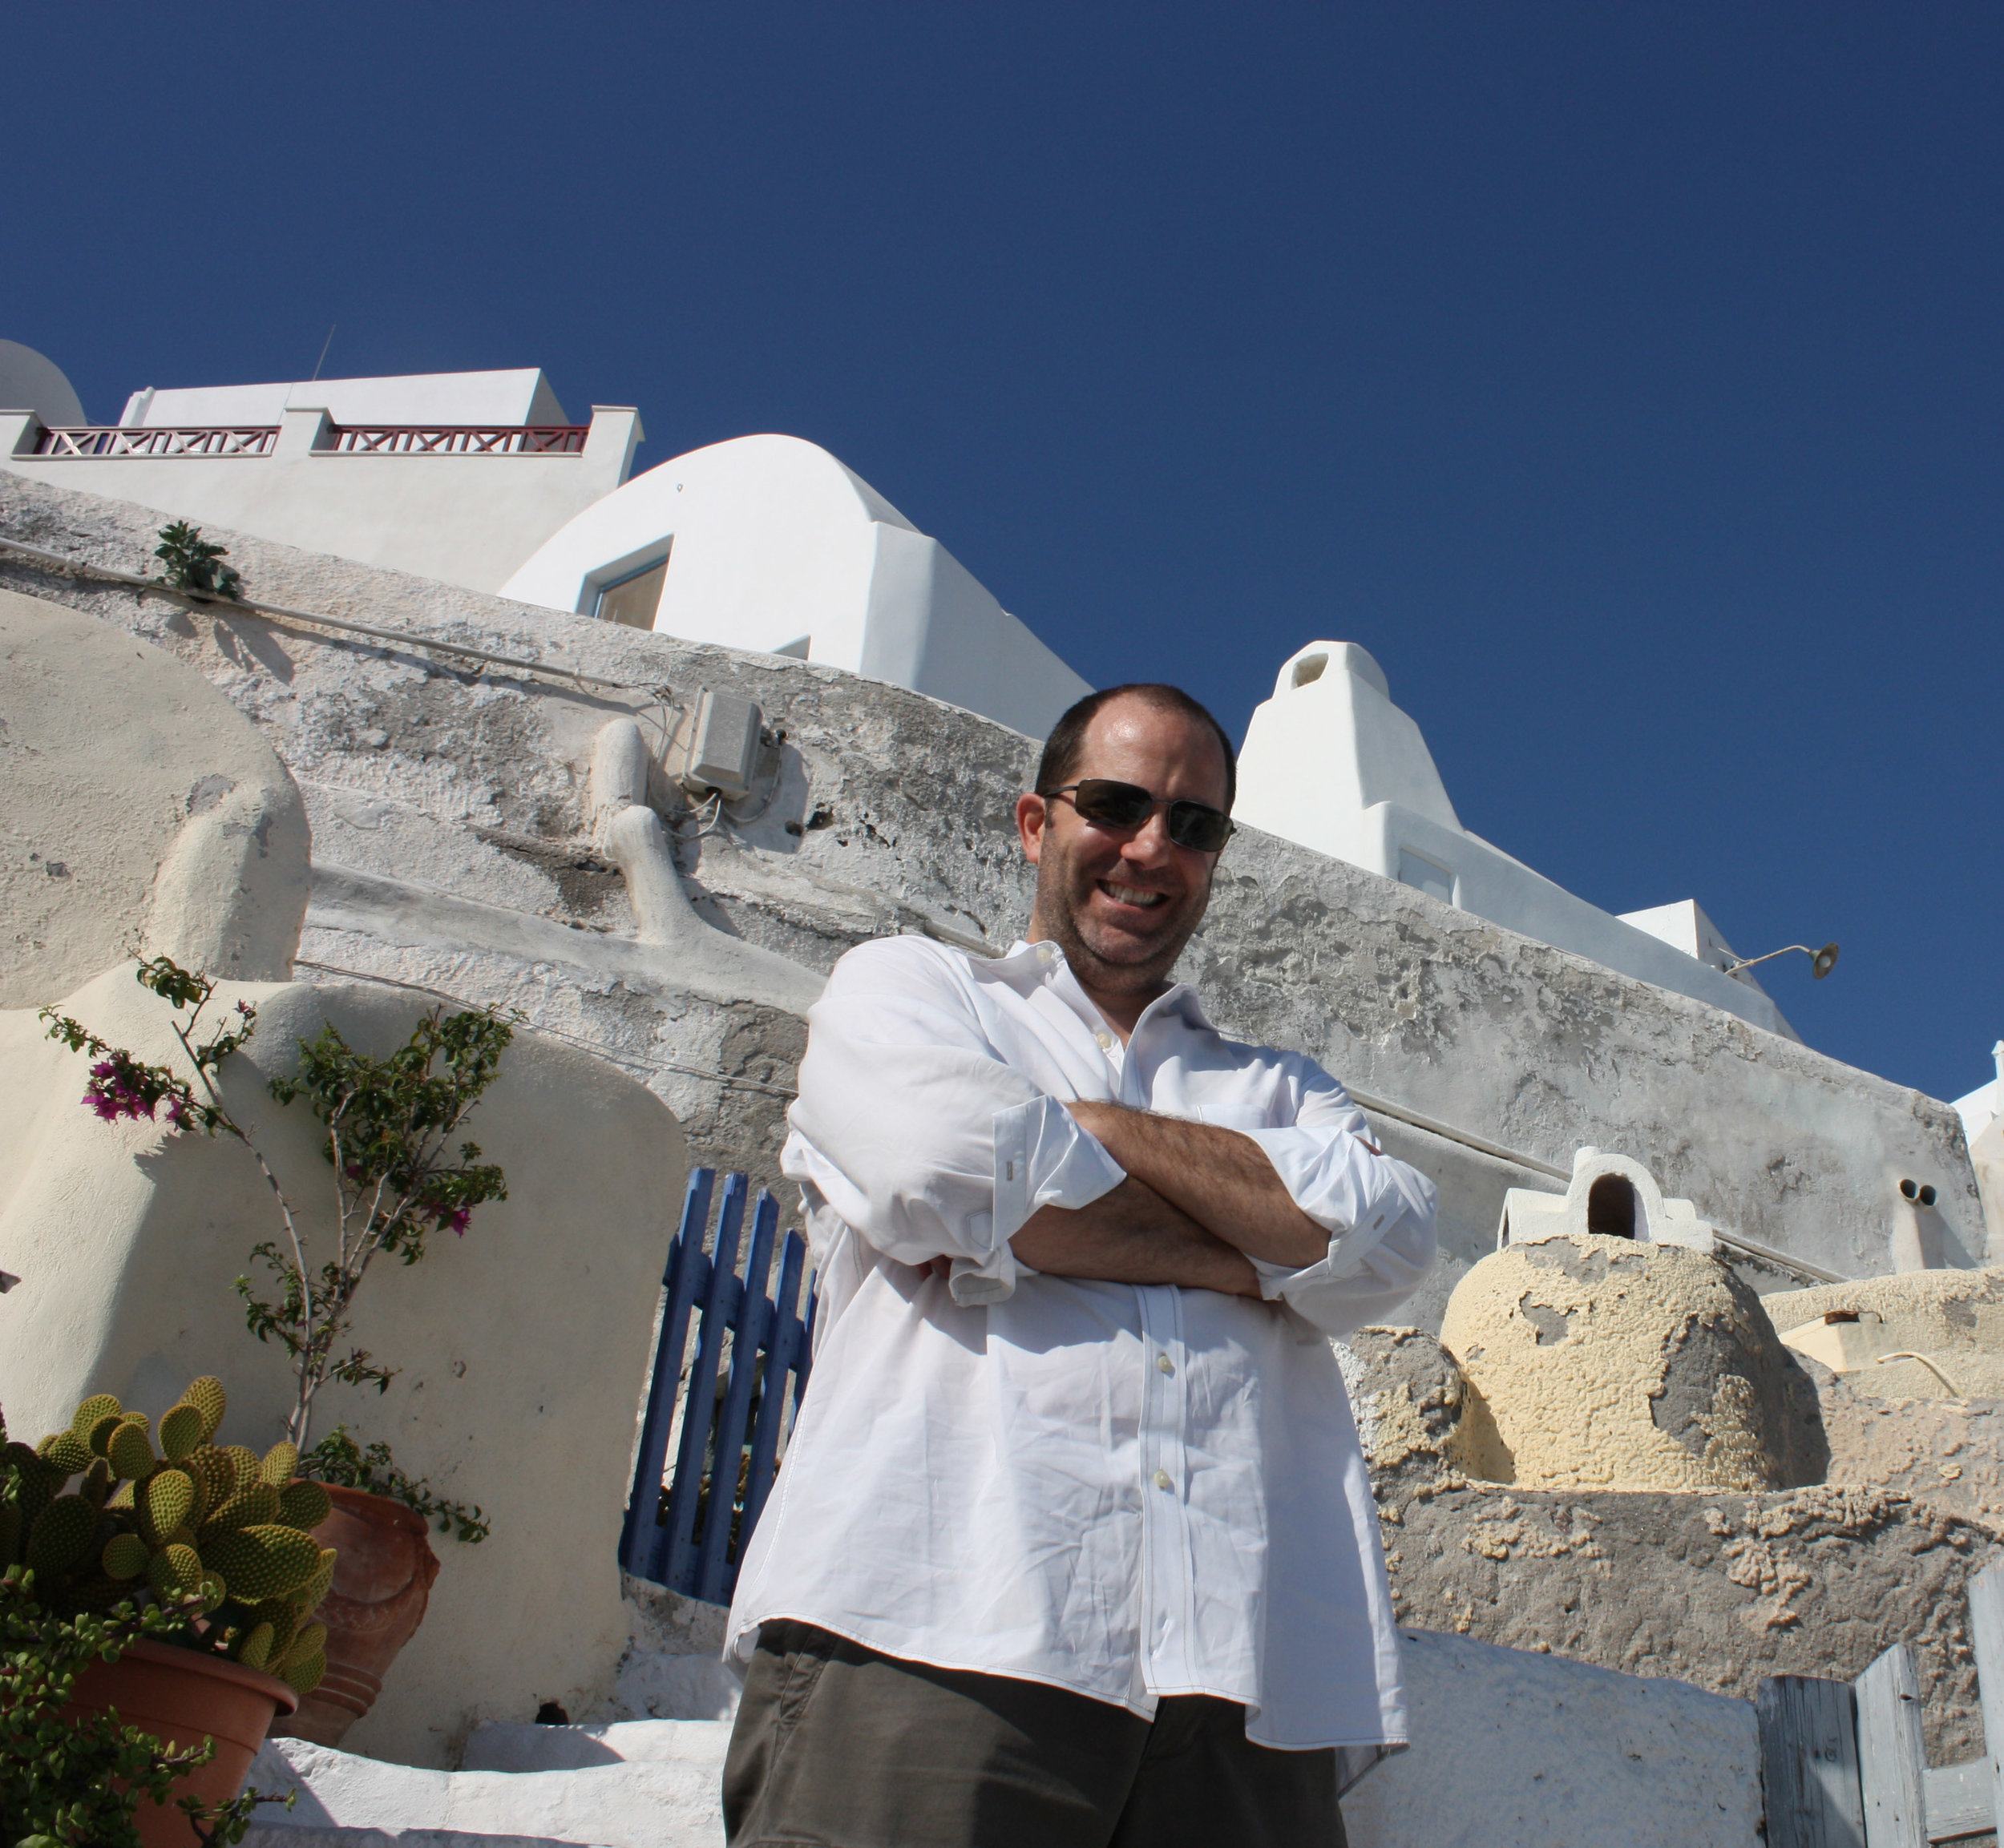 2010 in Oia, Greece (Santorini)